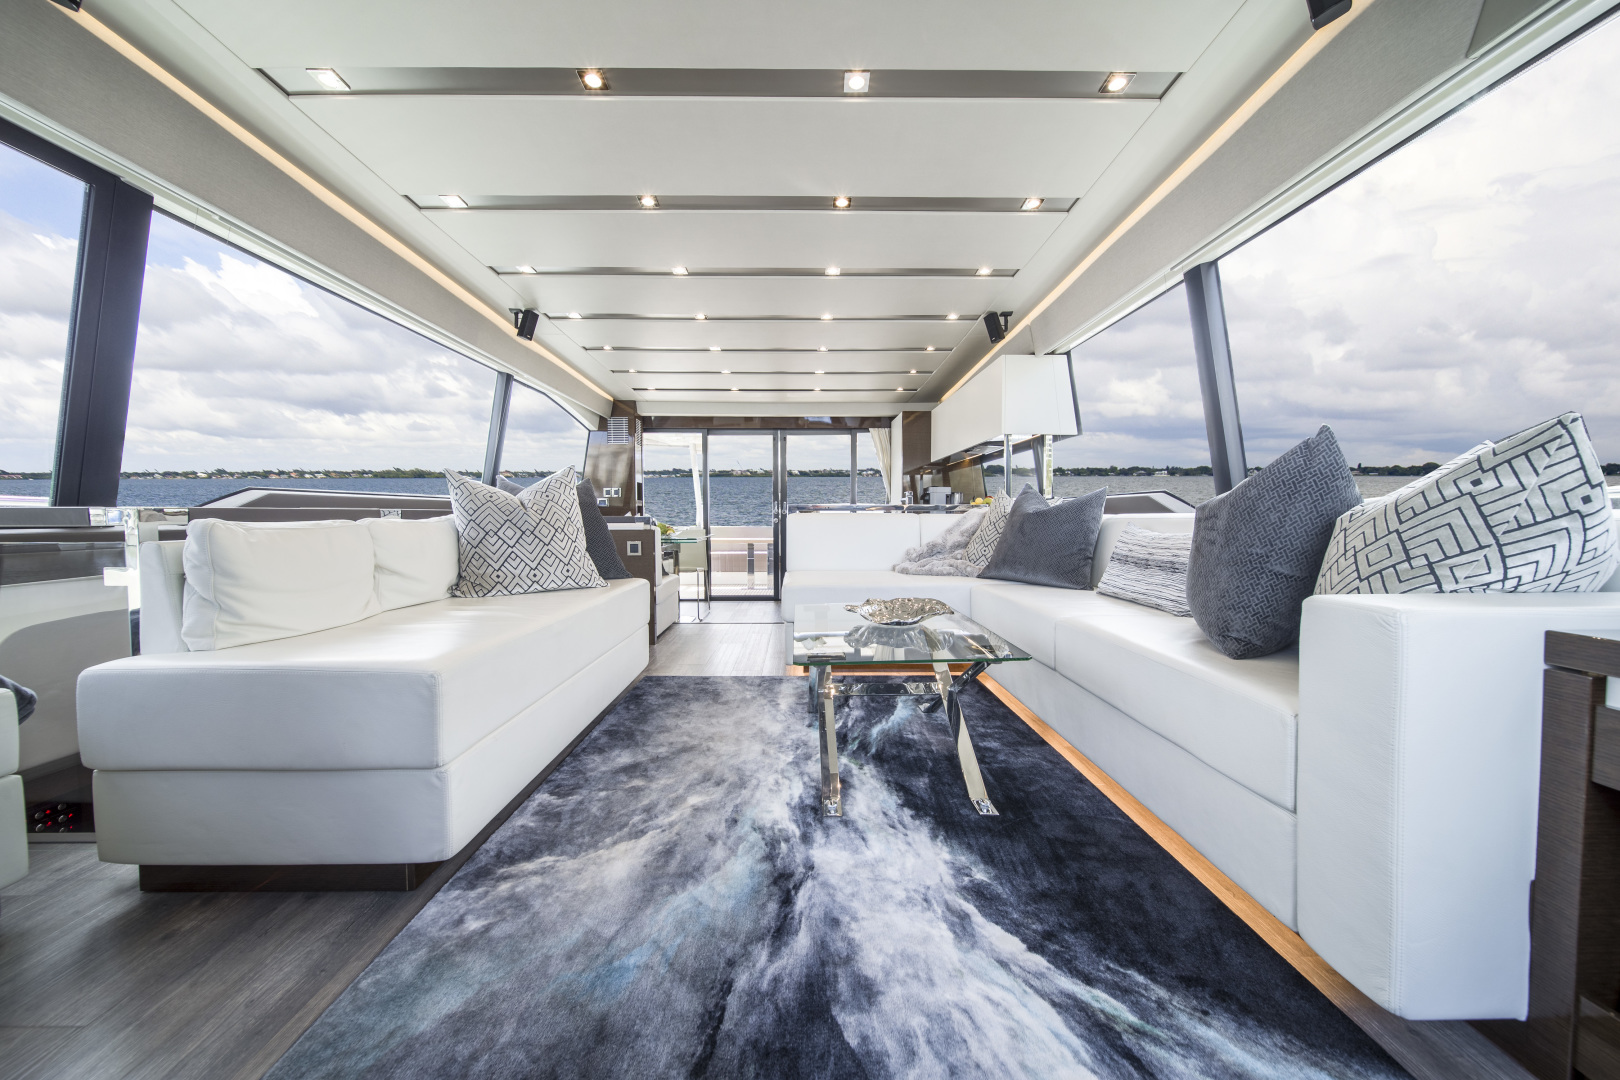 Prestige-680 Flybridge 2018-Seduction Sarasota-Florida-United States-2018 68 Prestige 680 Flybridge  Salon-1498921 | Thumbnail